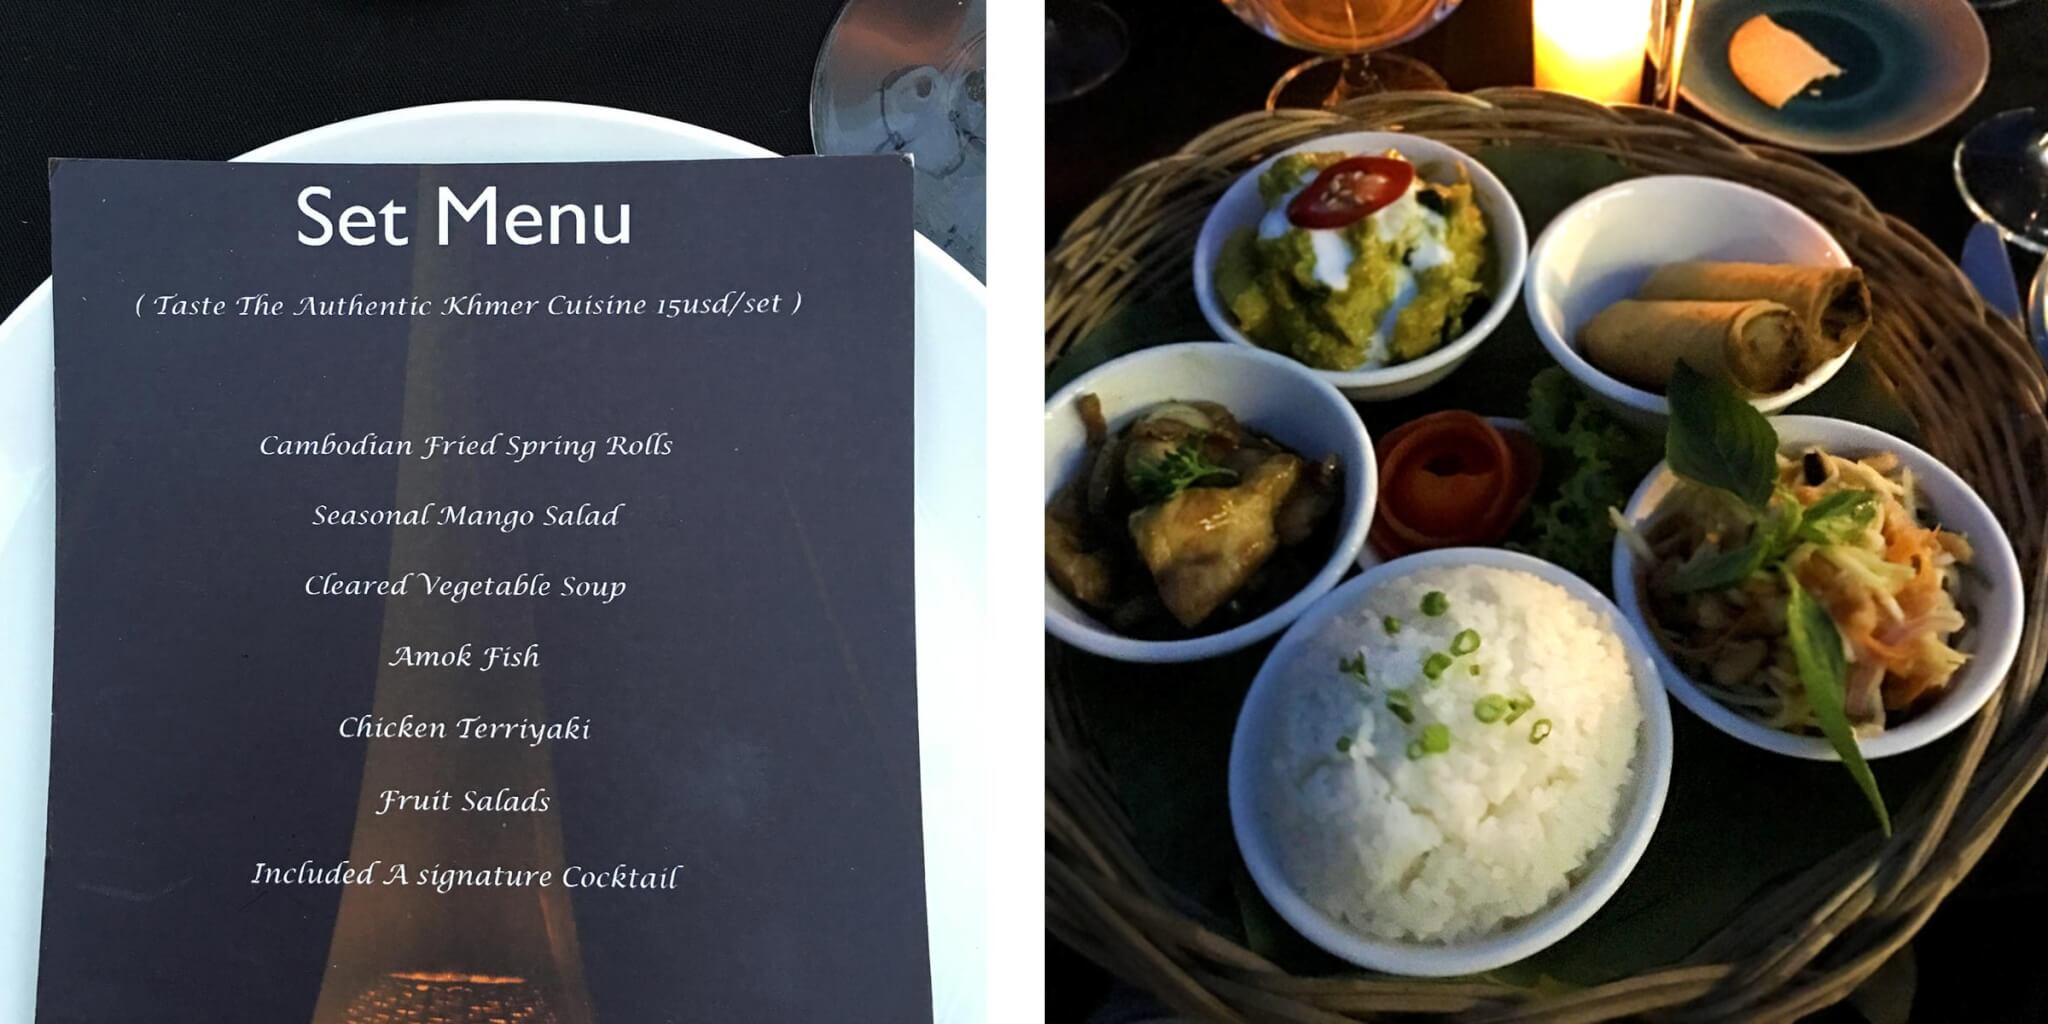 ABBA Cafe Siem Reap, Khmer Set Menü